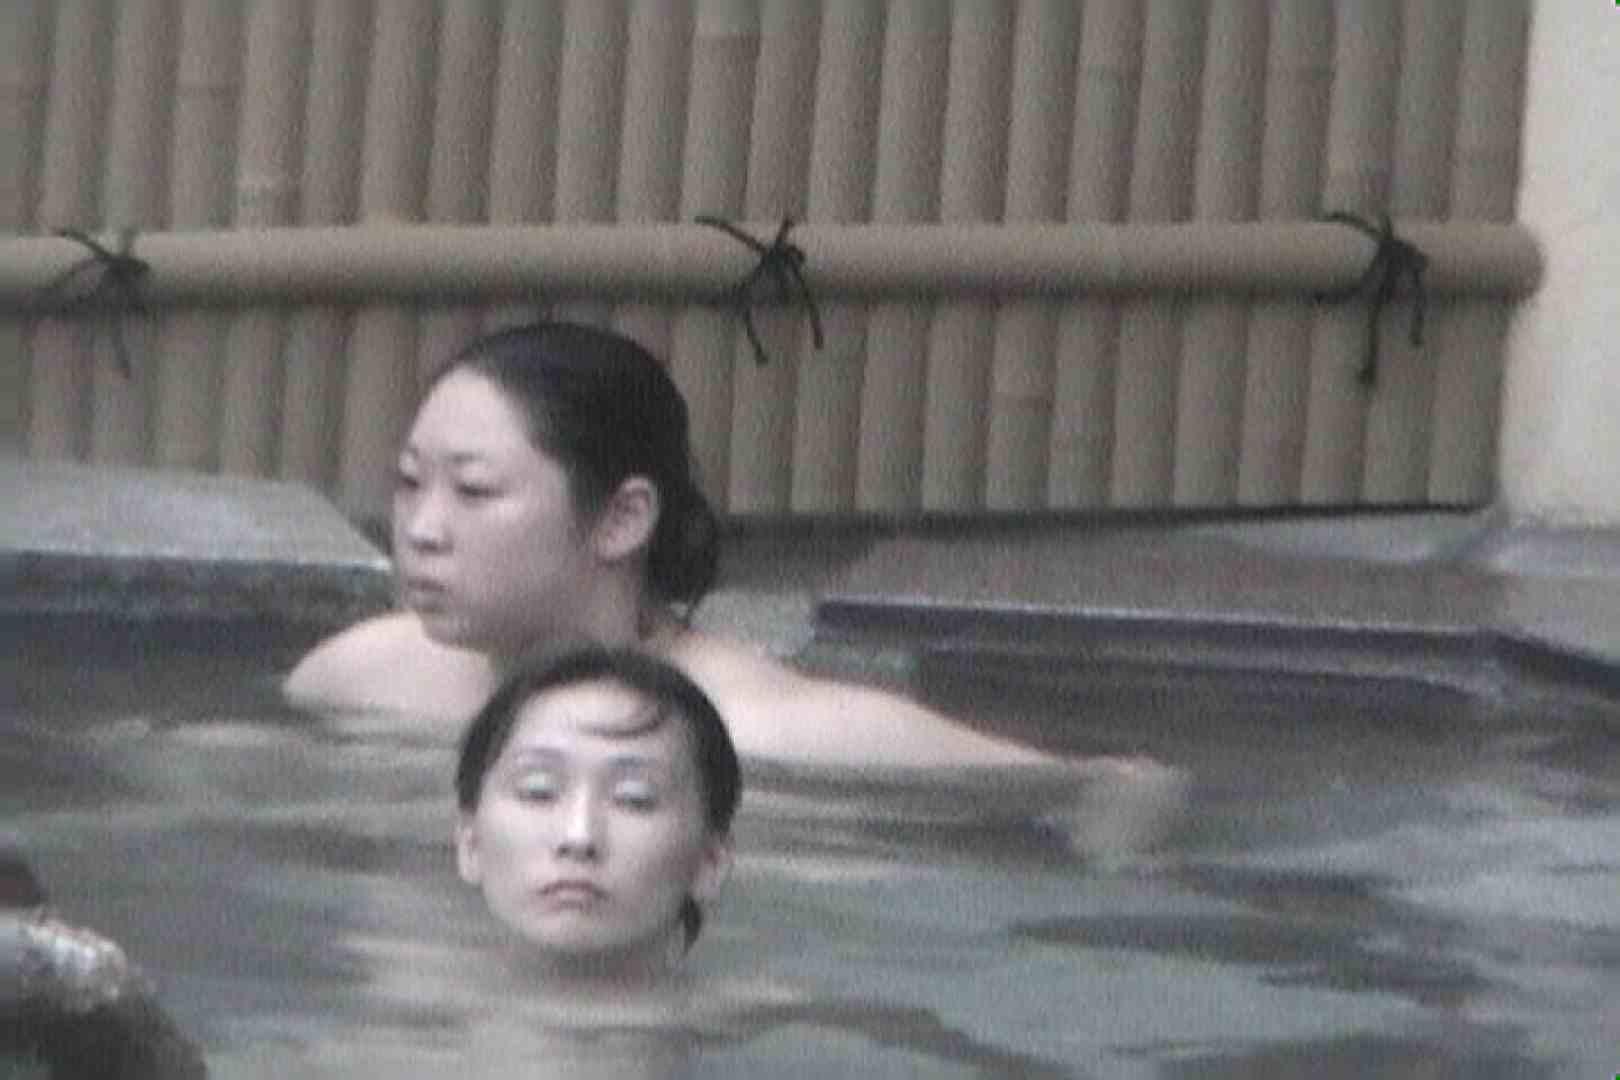 Aquaな露天風呂Vol.557 露天風呂編 | 盗撮シリーズ  100PIX 31